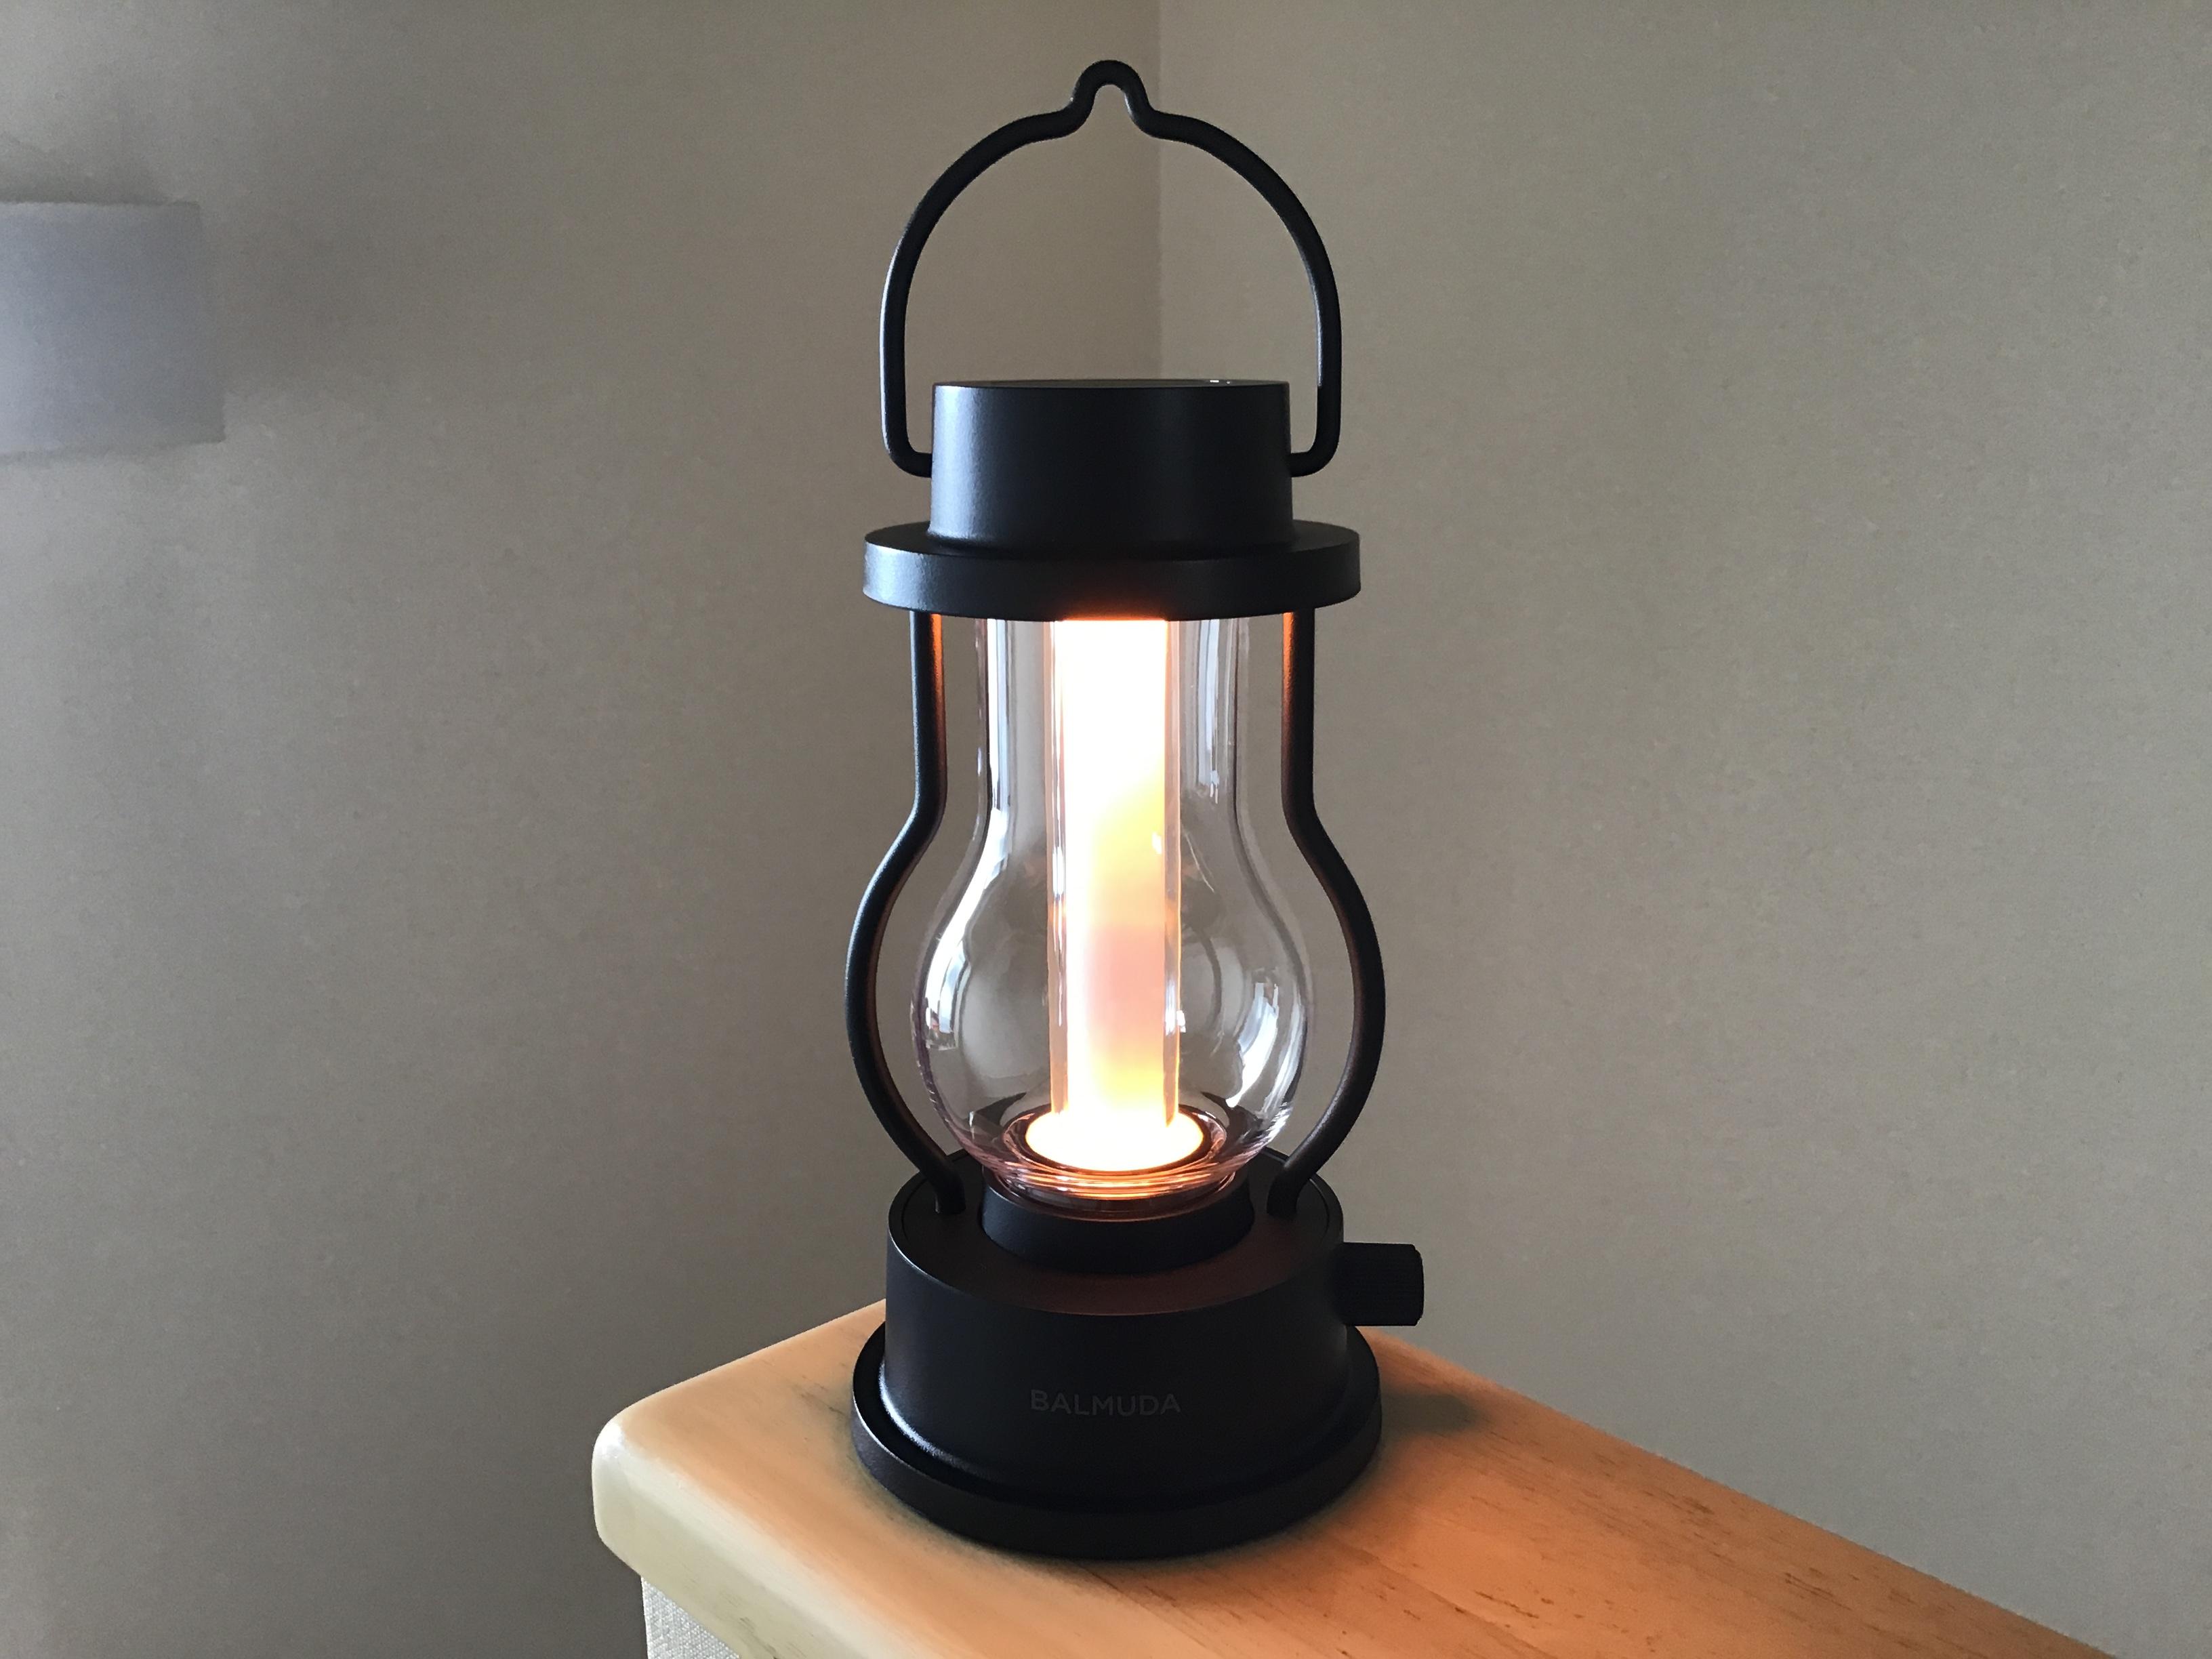 2020-08-17-lantern-2.jpg